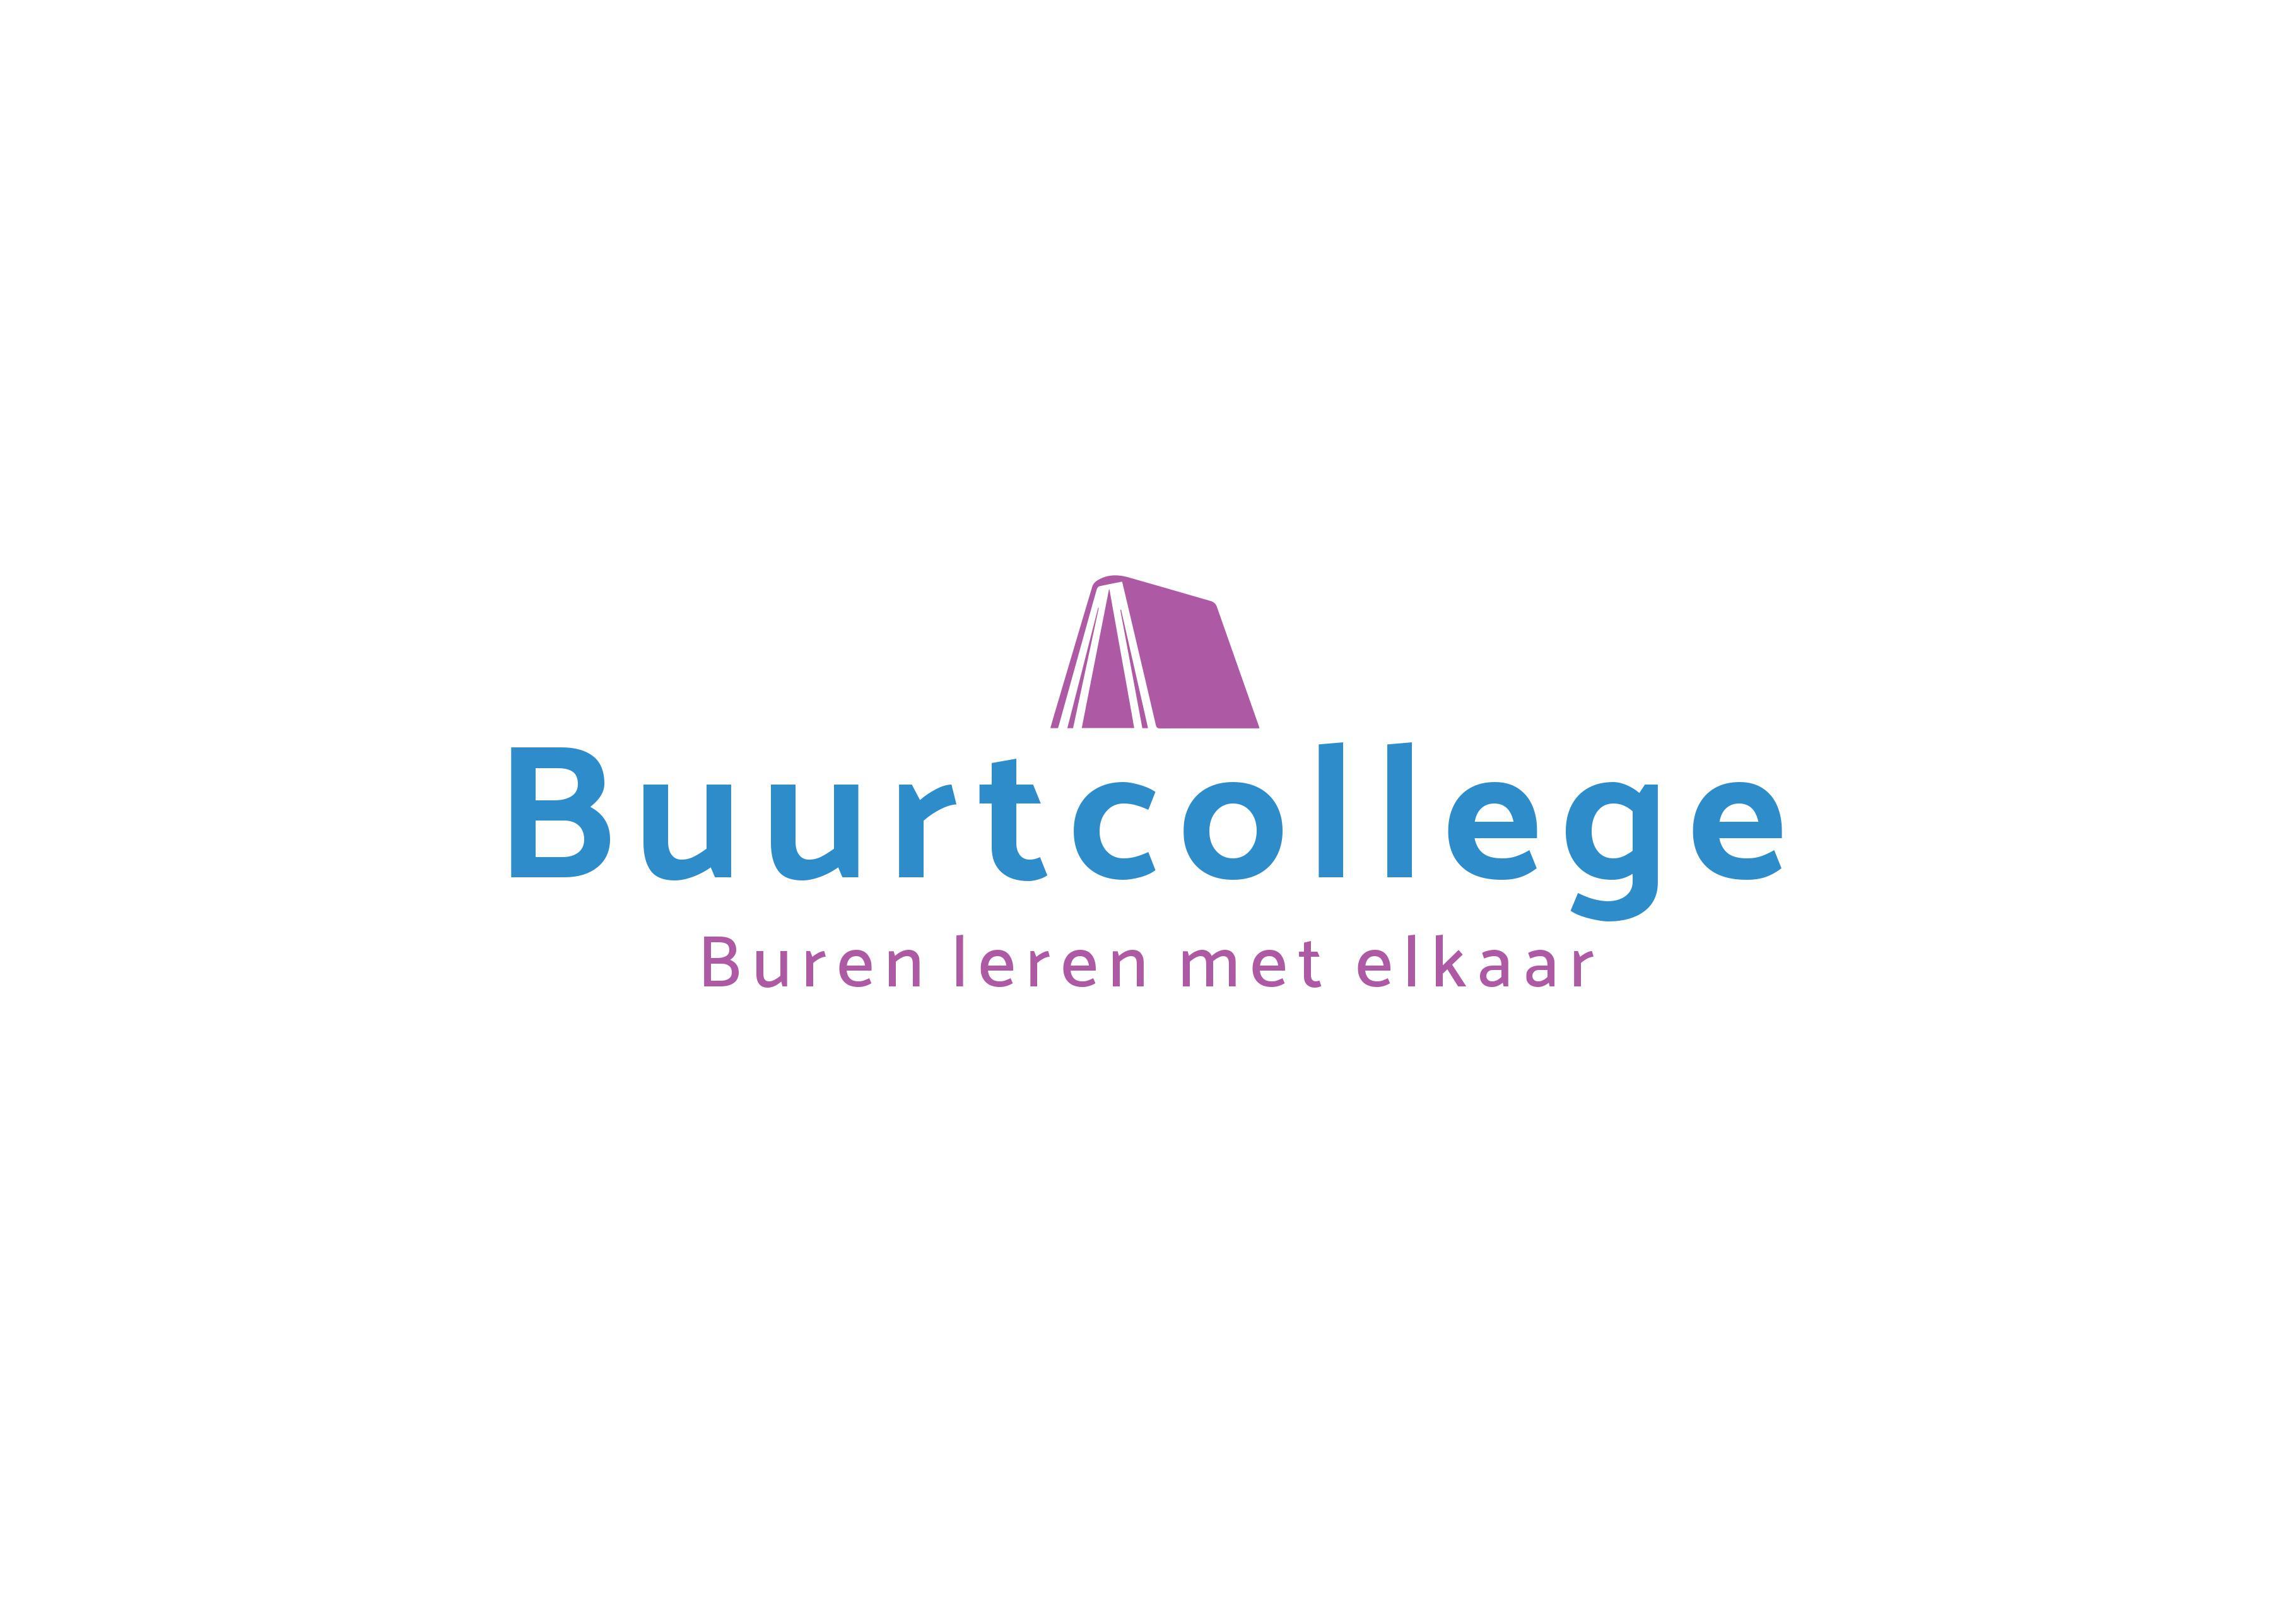 Buurtcollege logo